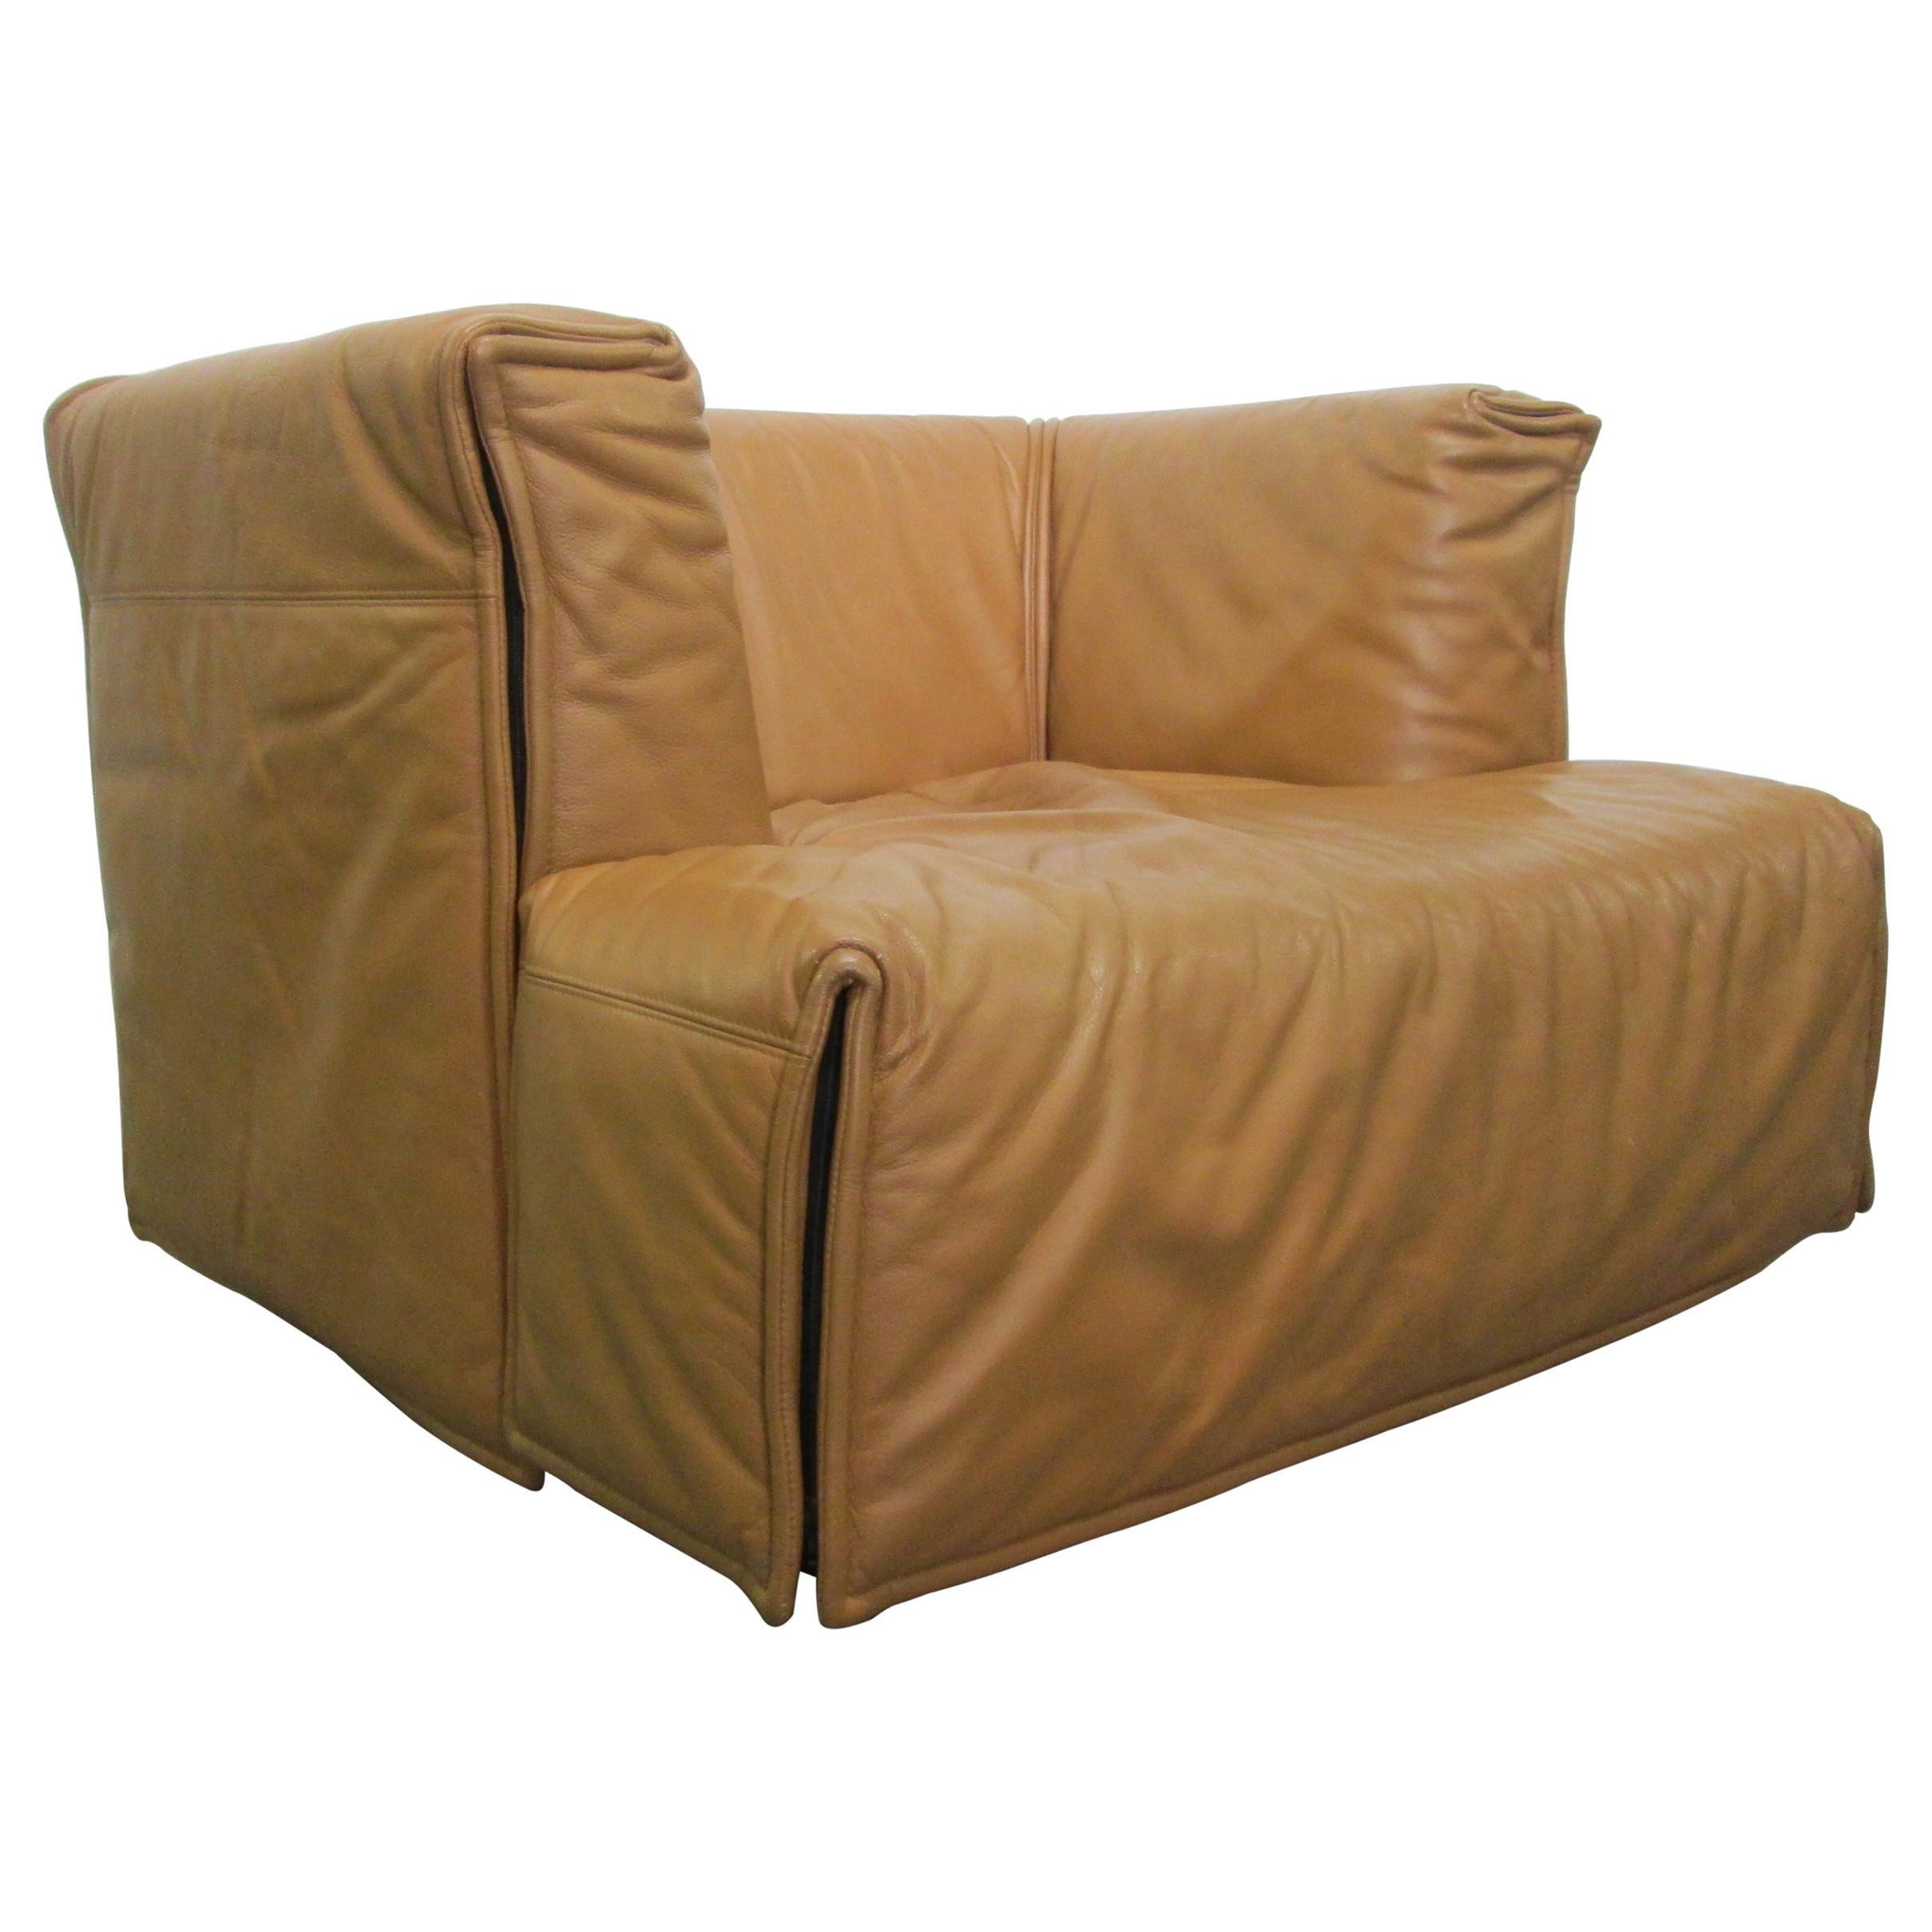 Unique Italian Leather Chair